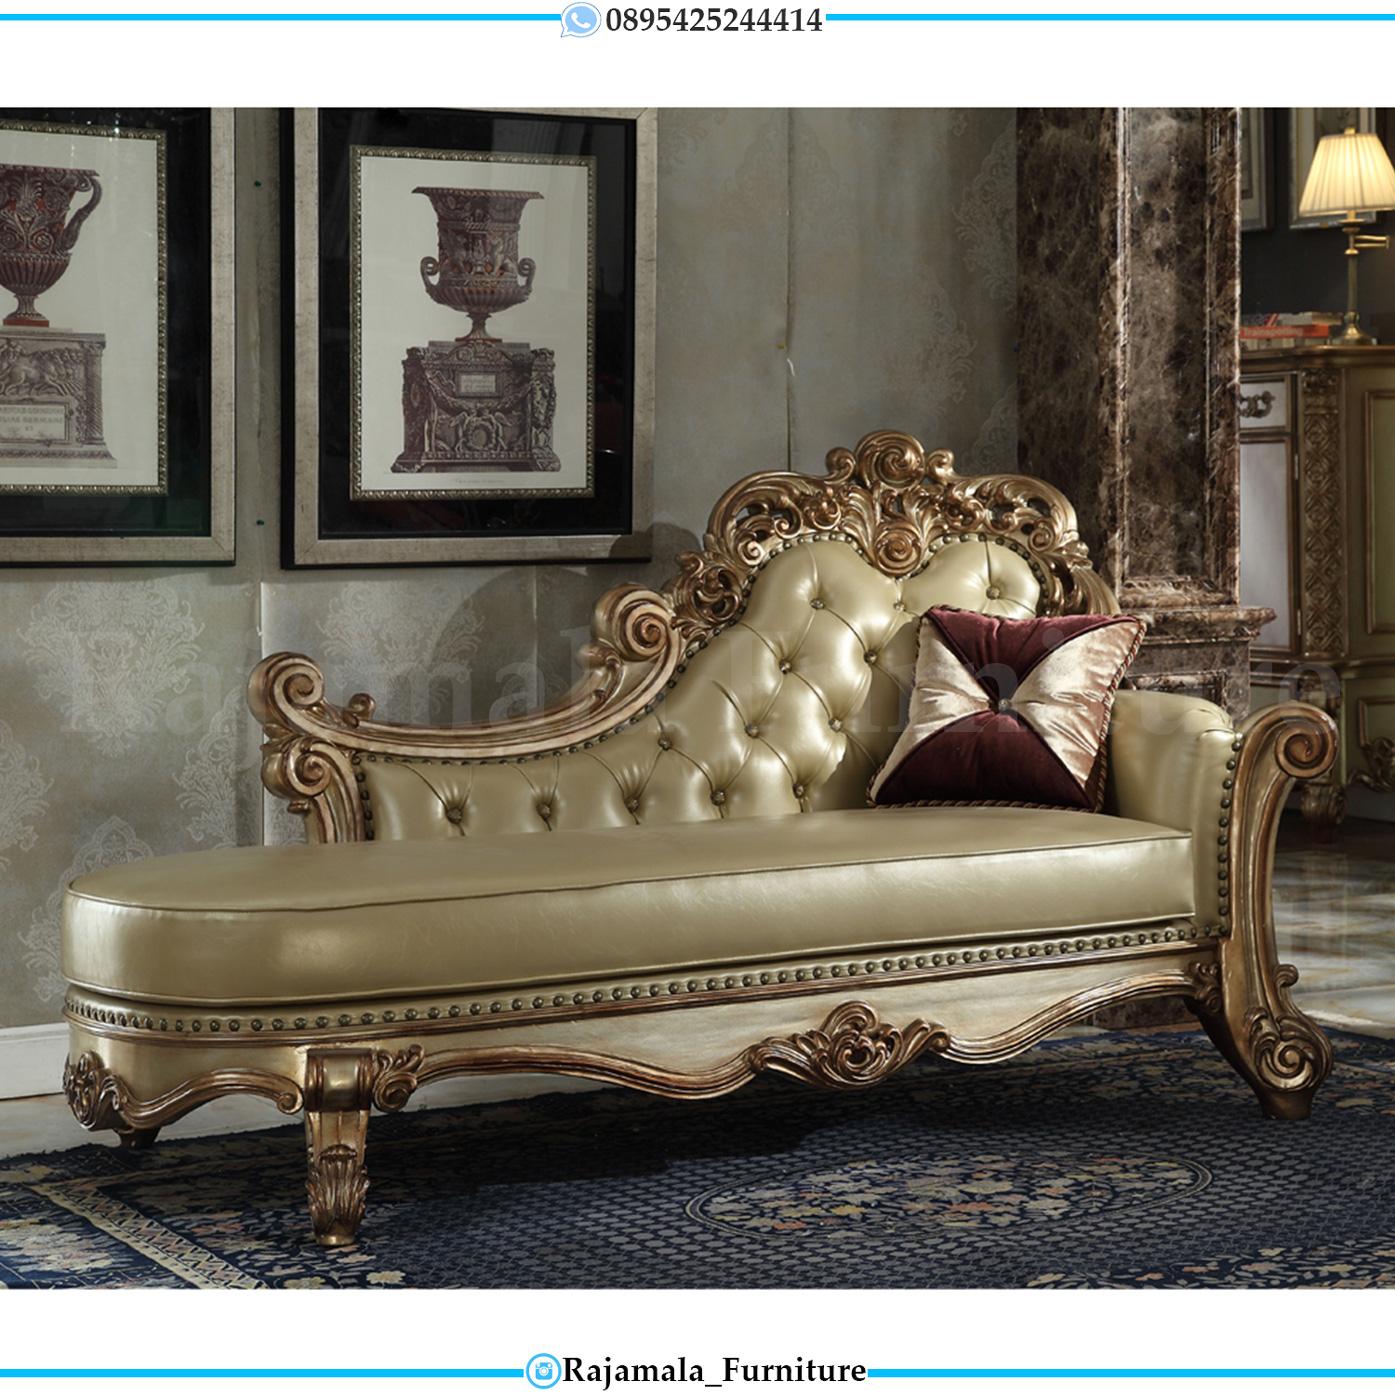 Harga Sofa Malas Mewah Ukiran Jepara Golden Luxury Color RM-0027